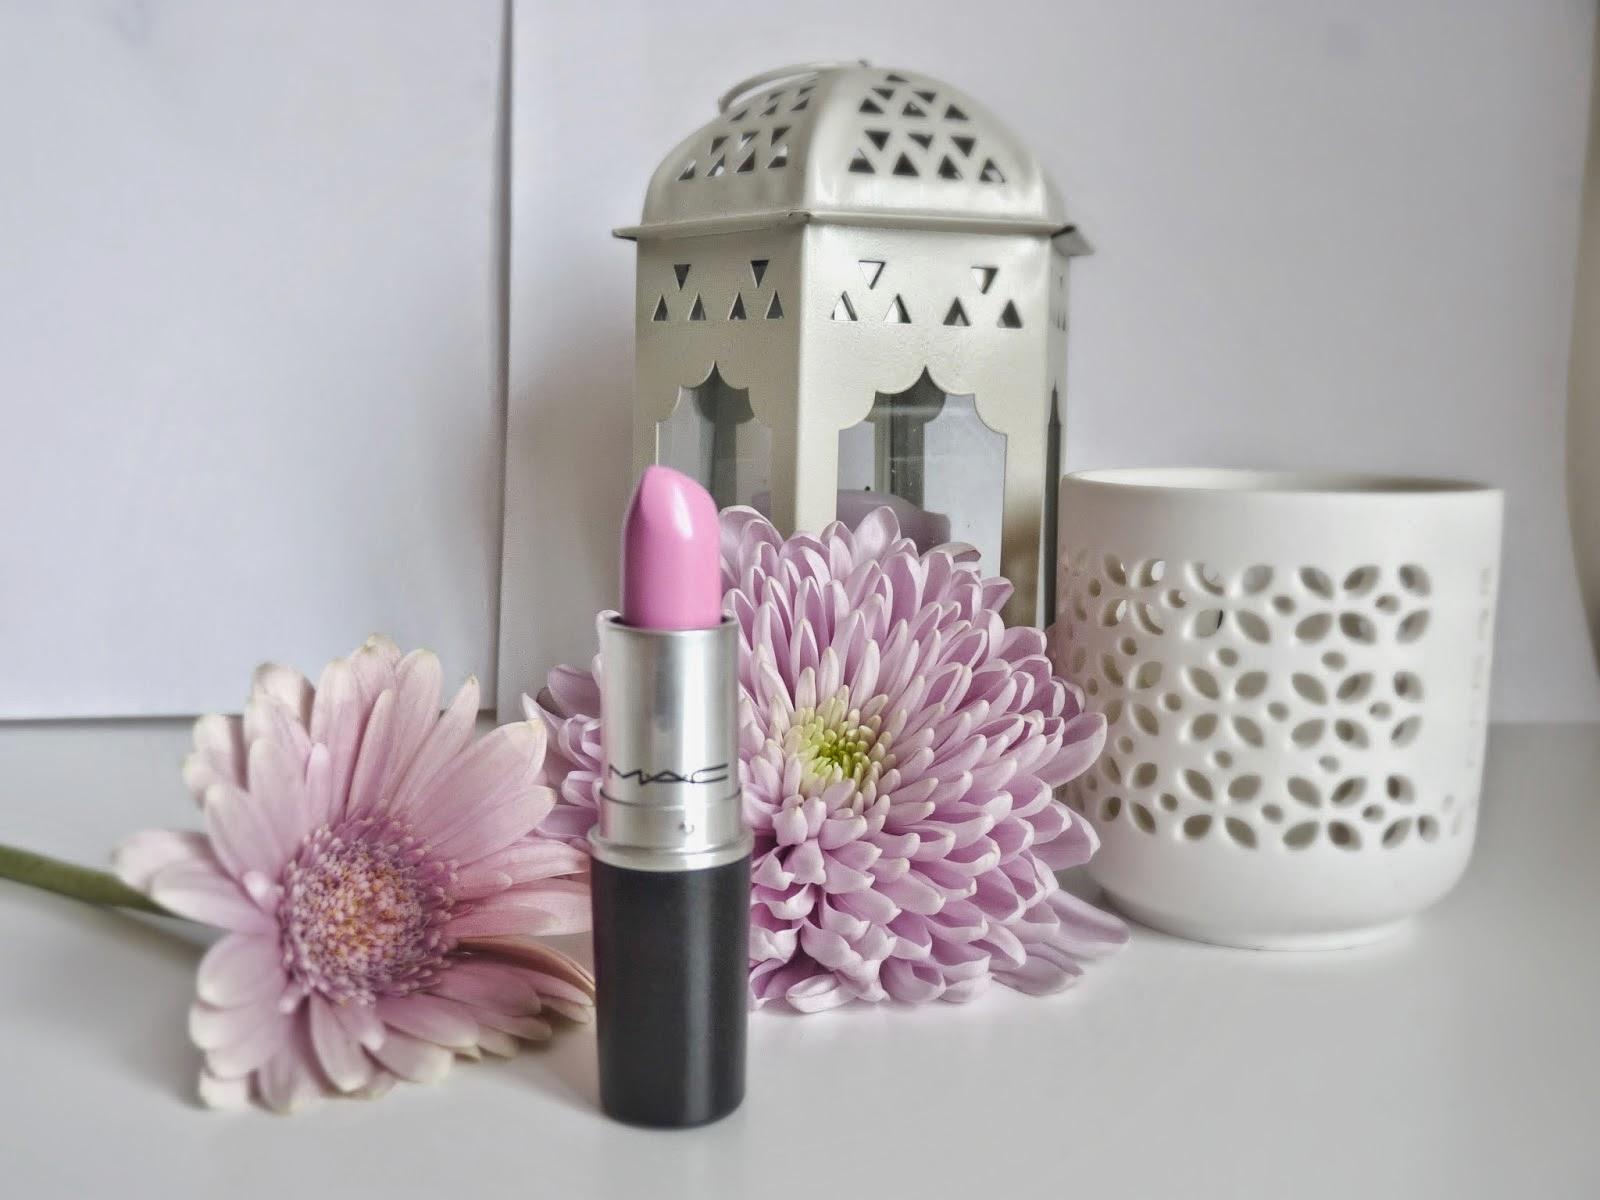 mac st germain lipstick review swatch makeup pink